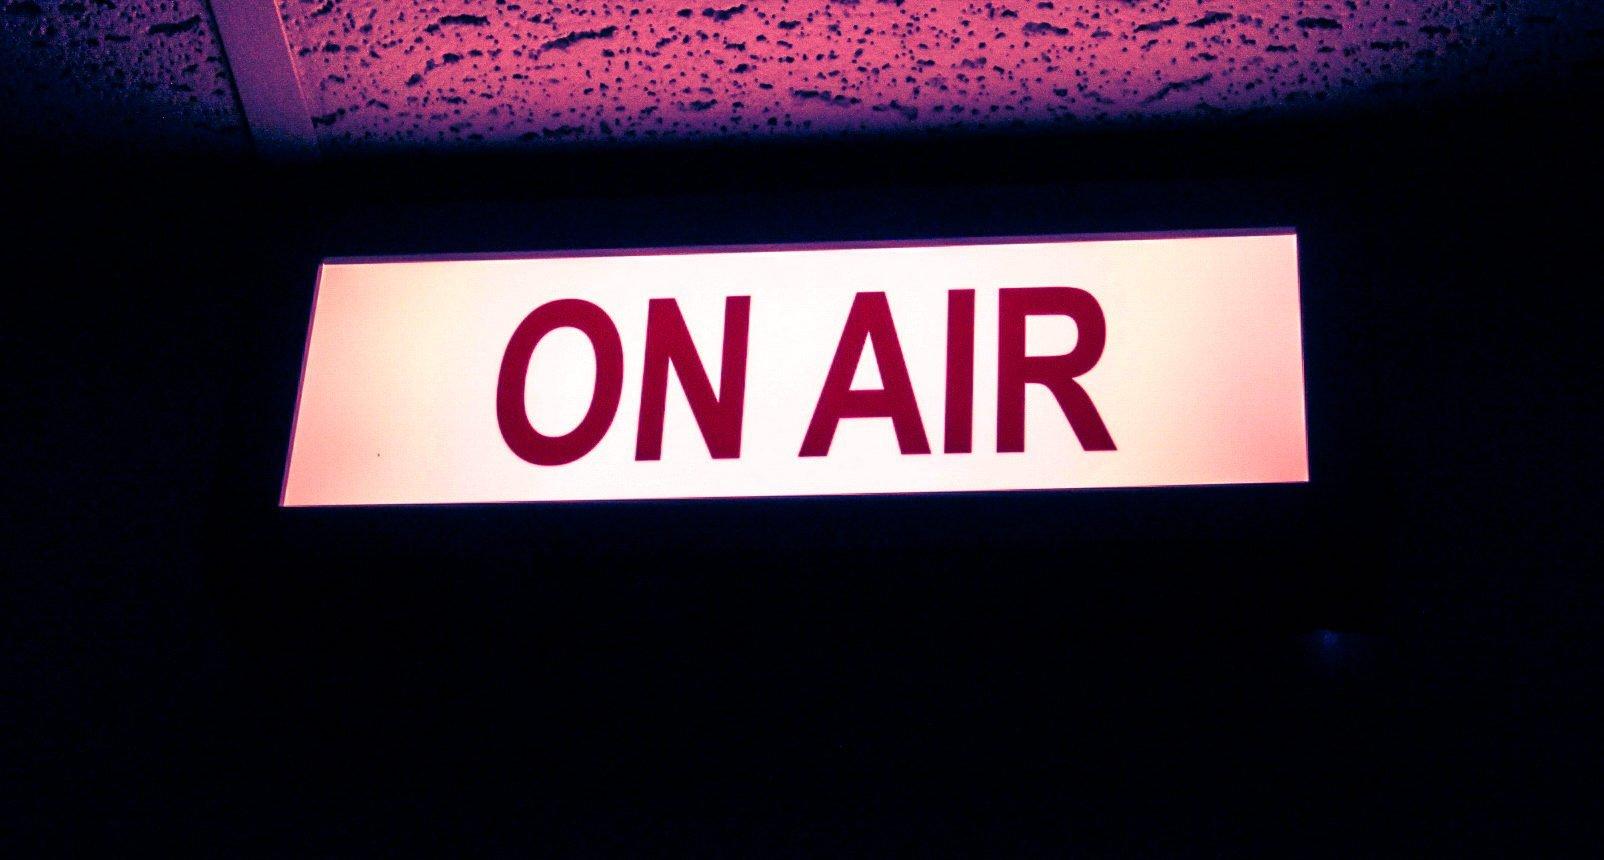 mzStudios Dallas, TX - Podcast Production and Recording Studios